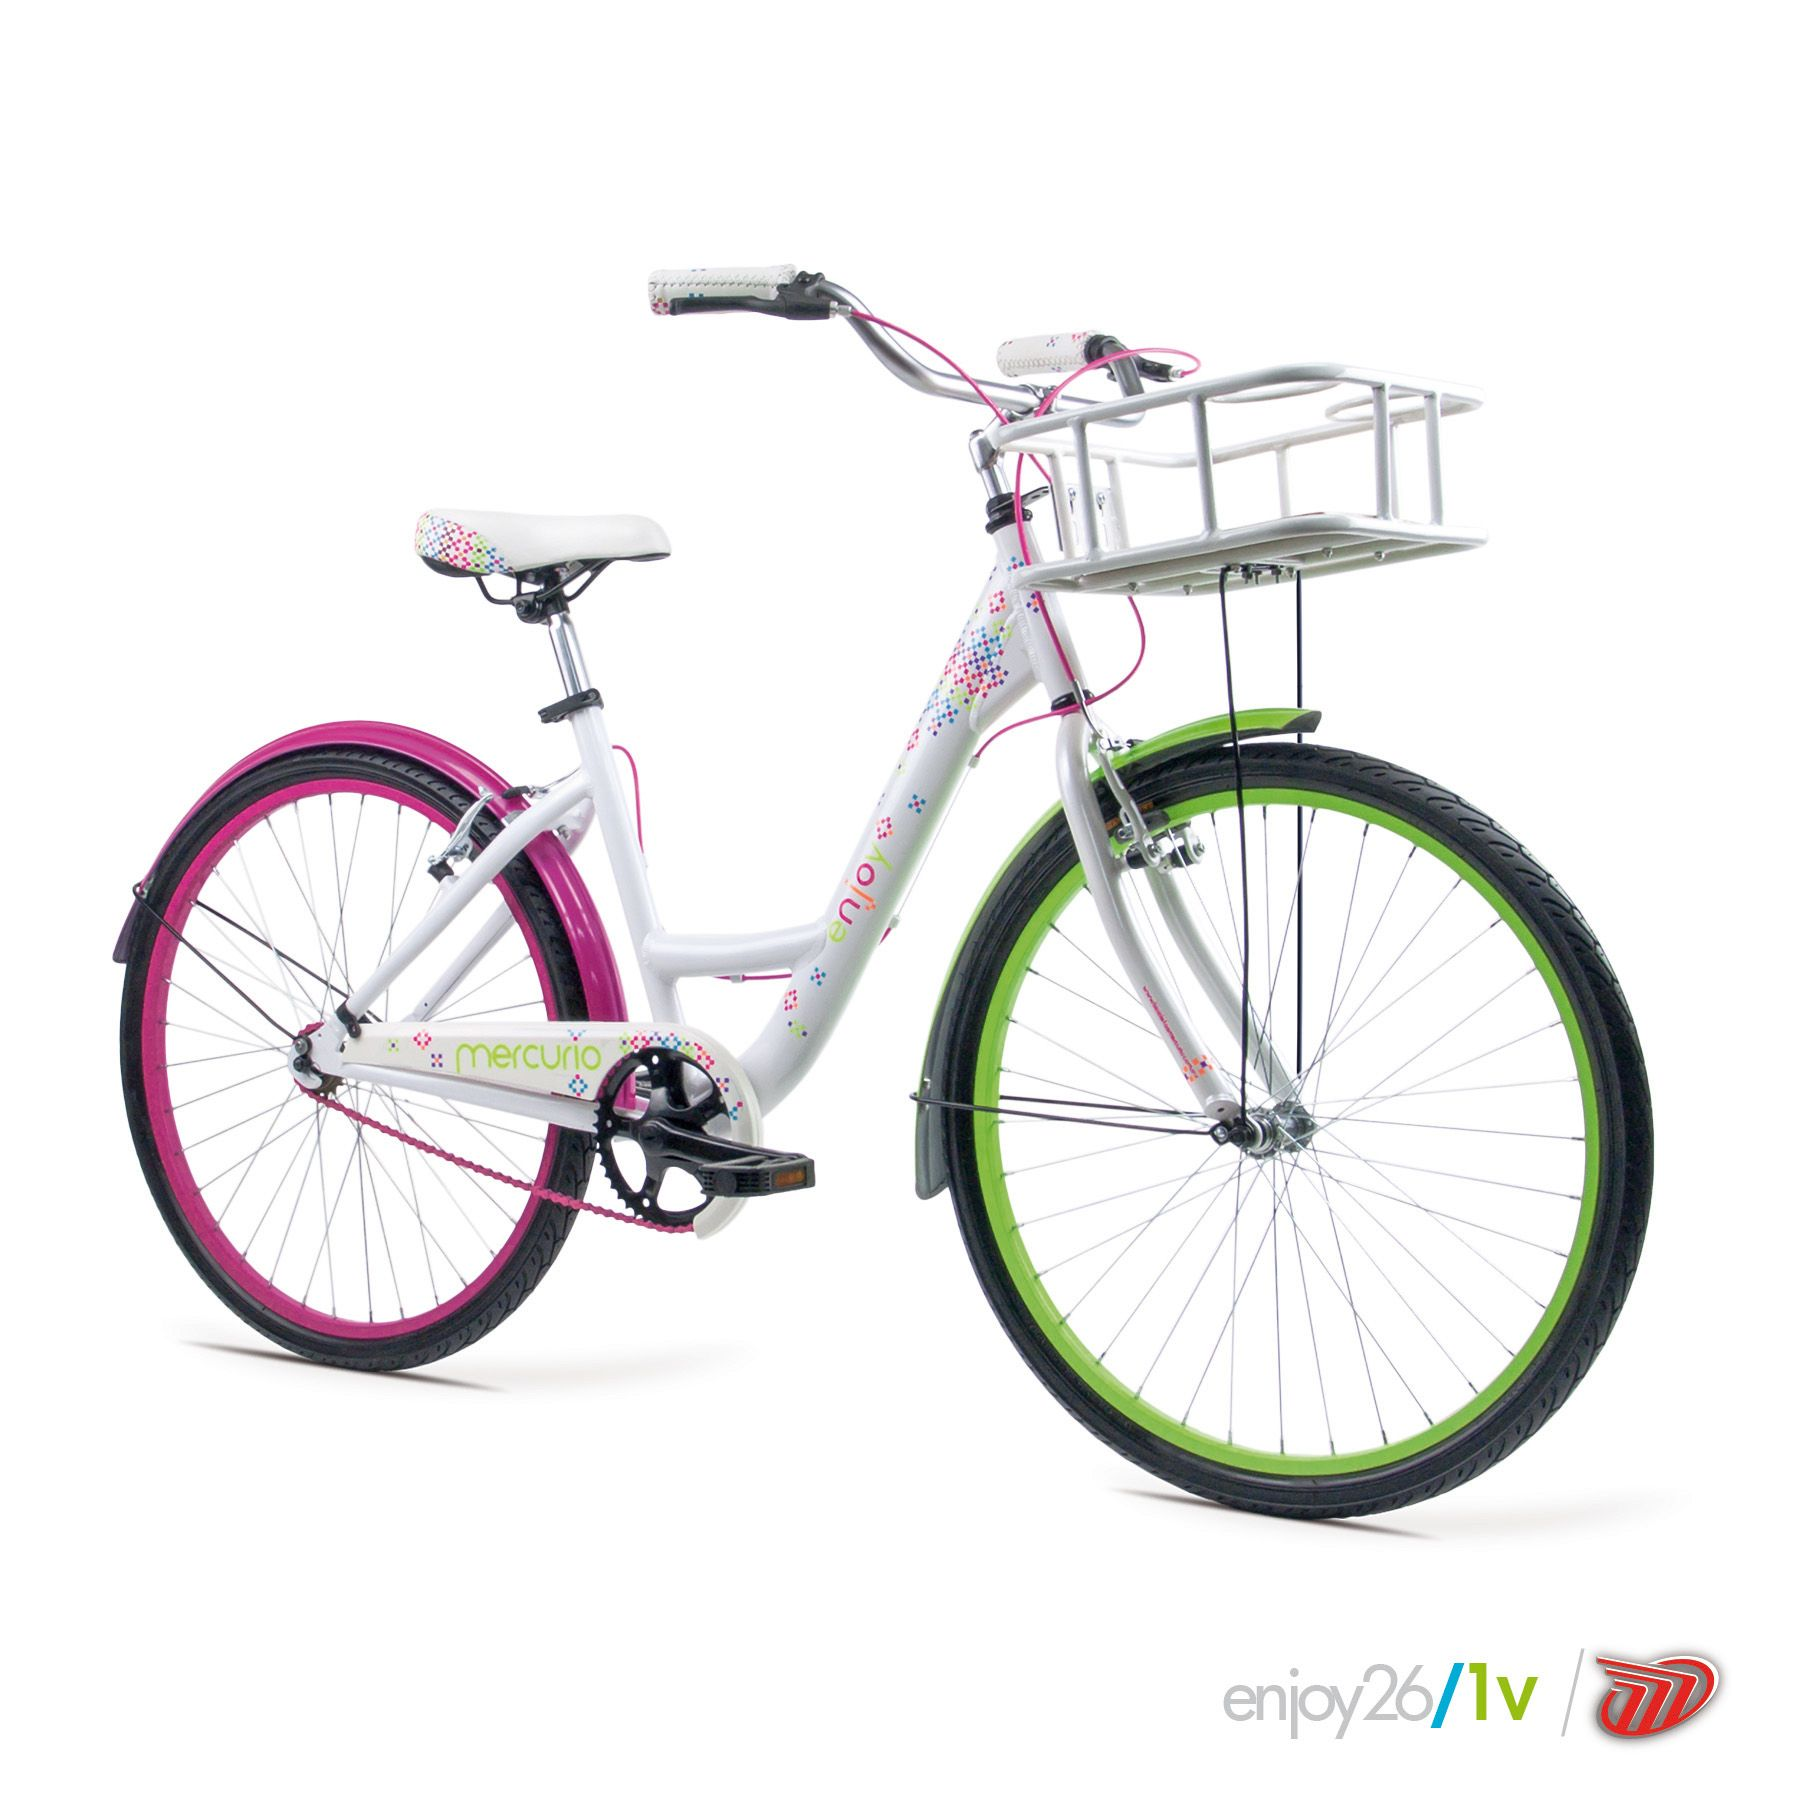 I <3 My Bike Enjoy :D #bikes #bicicletas #bicicletasmercurio